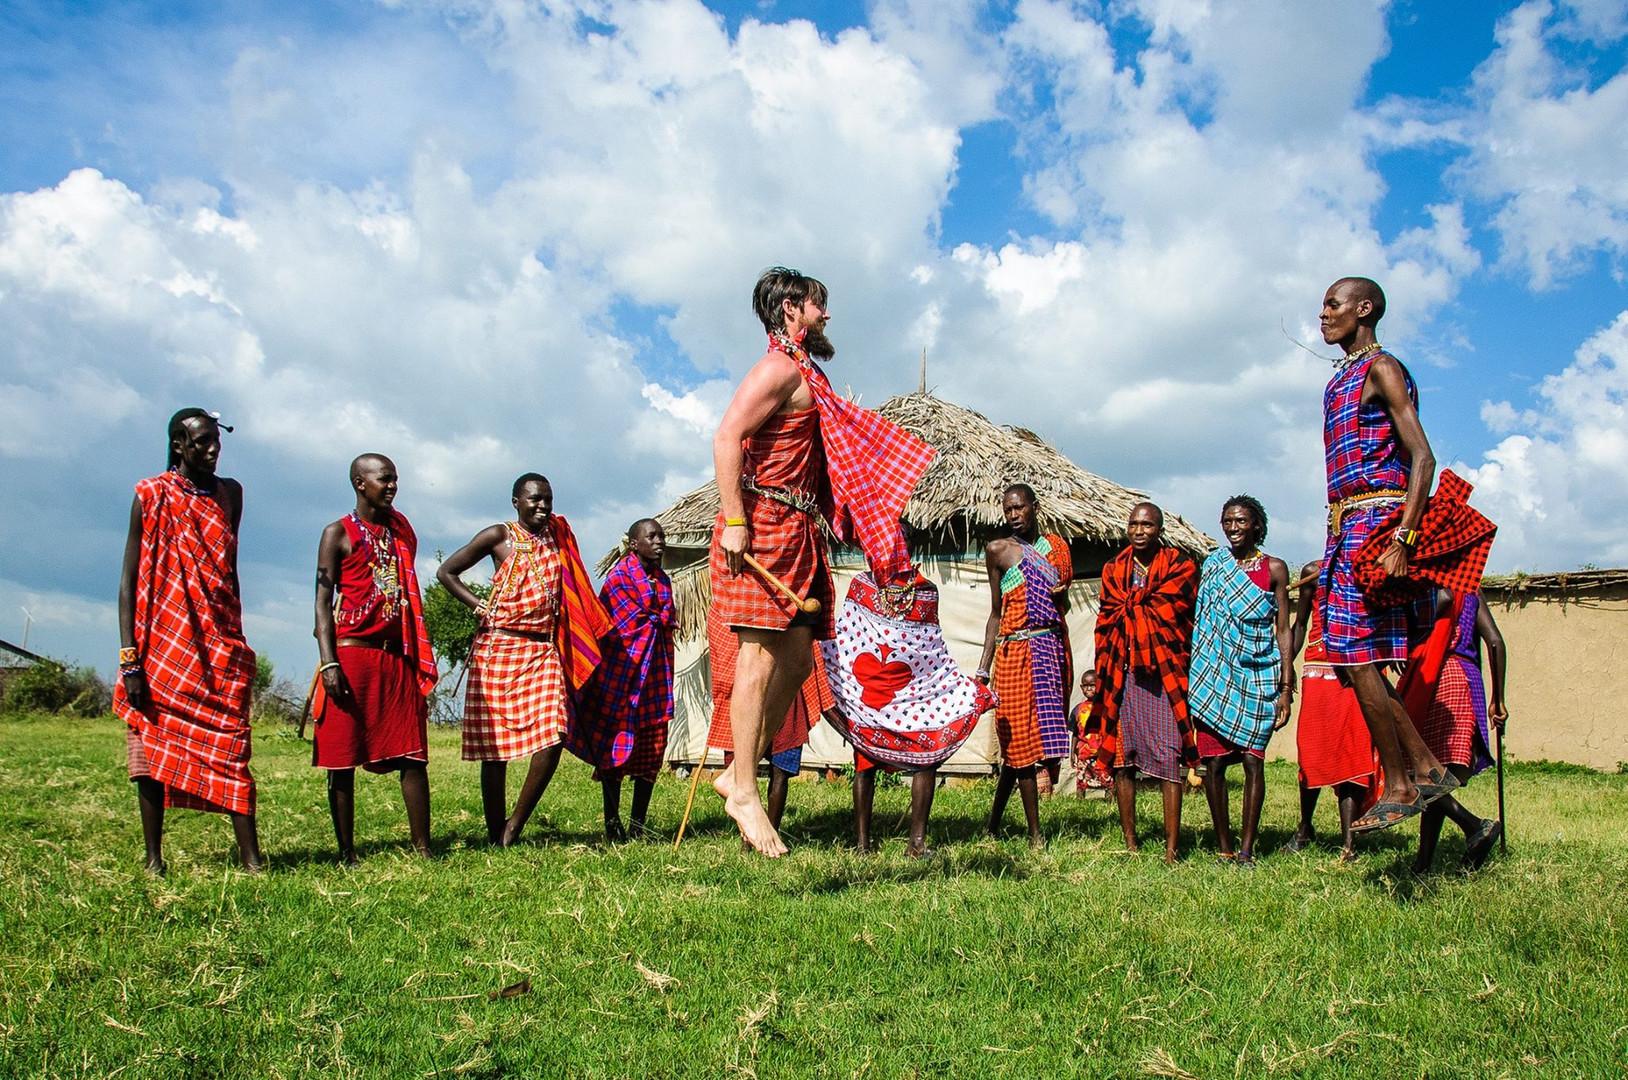 Maasai Jumping competition dance